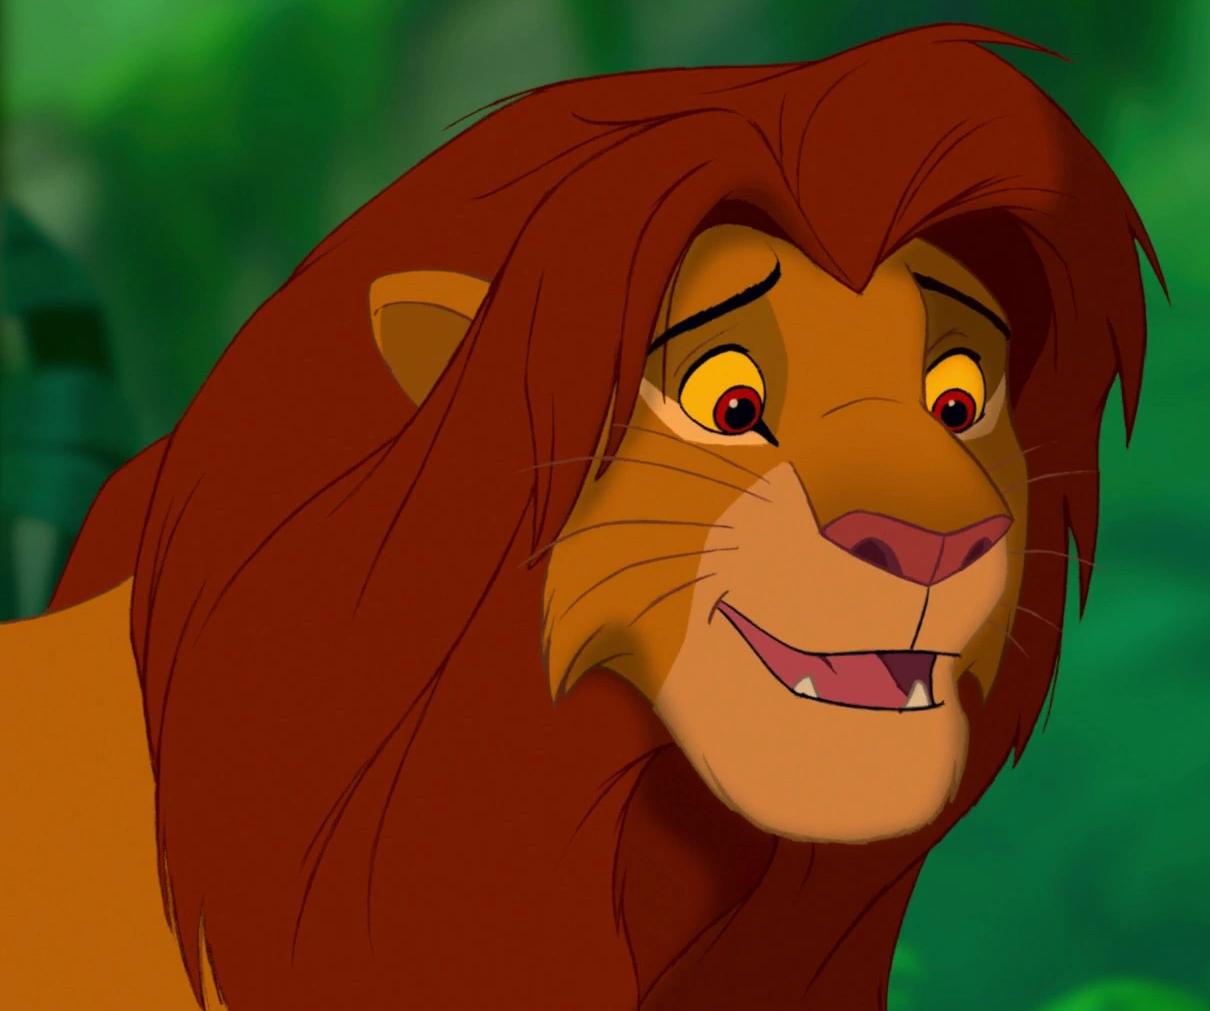 Simba | The Lion King Wiki | FANDOM powered by Wikia